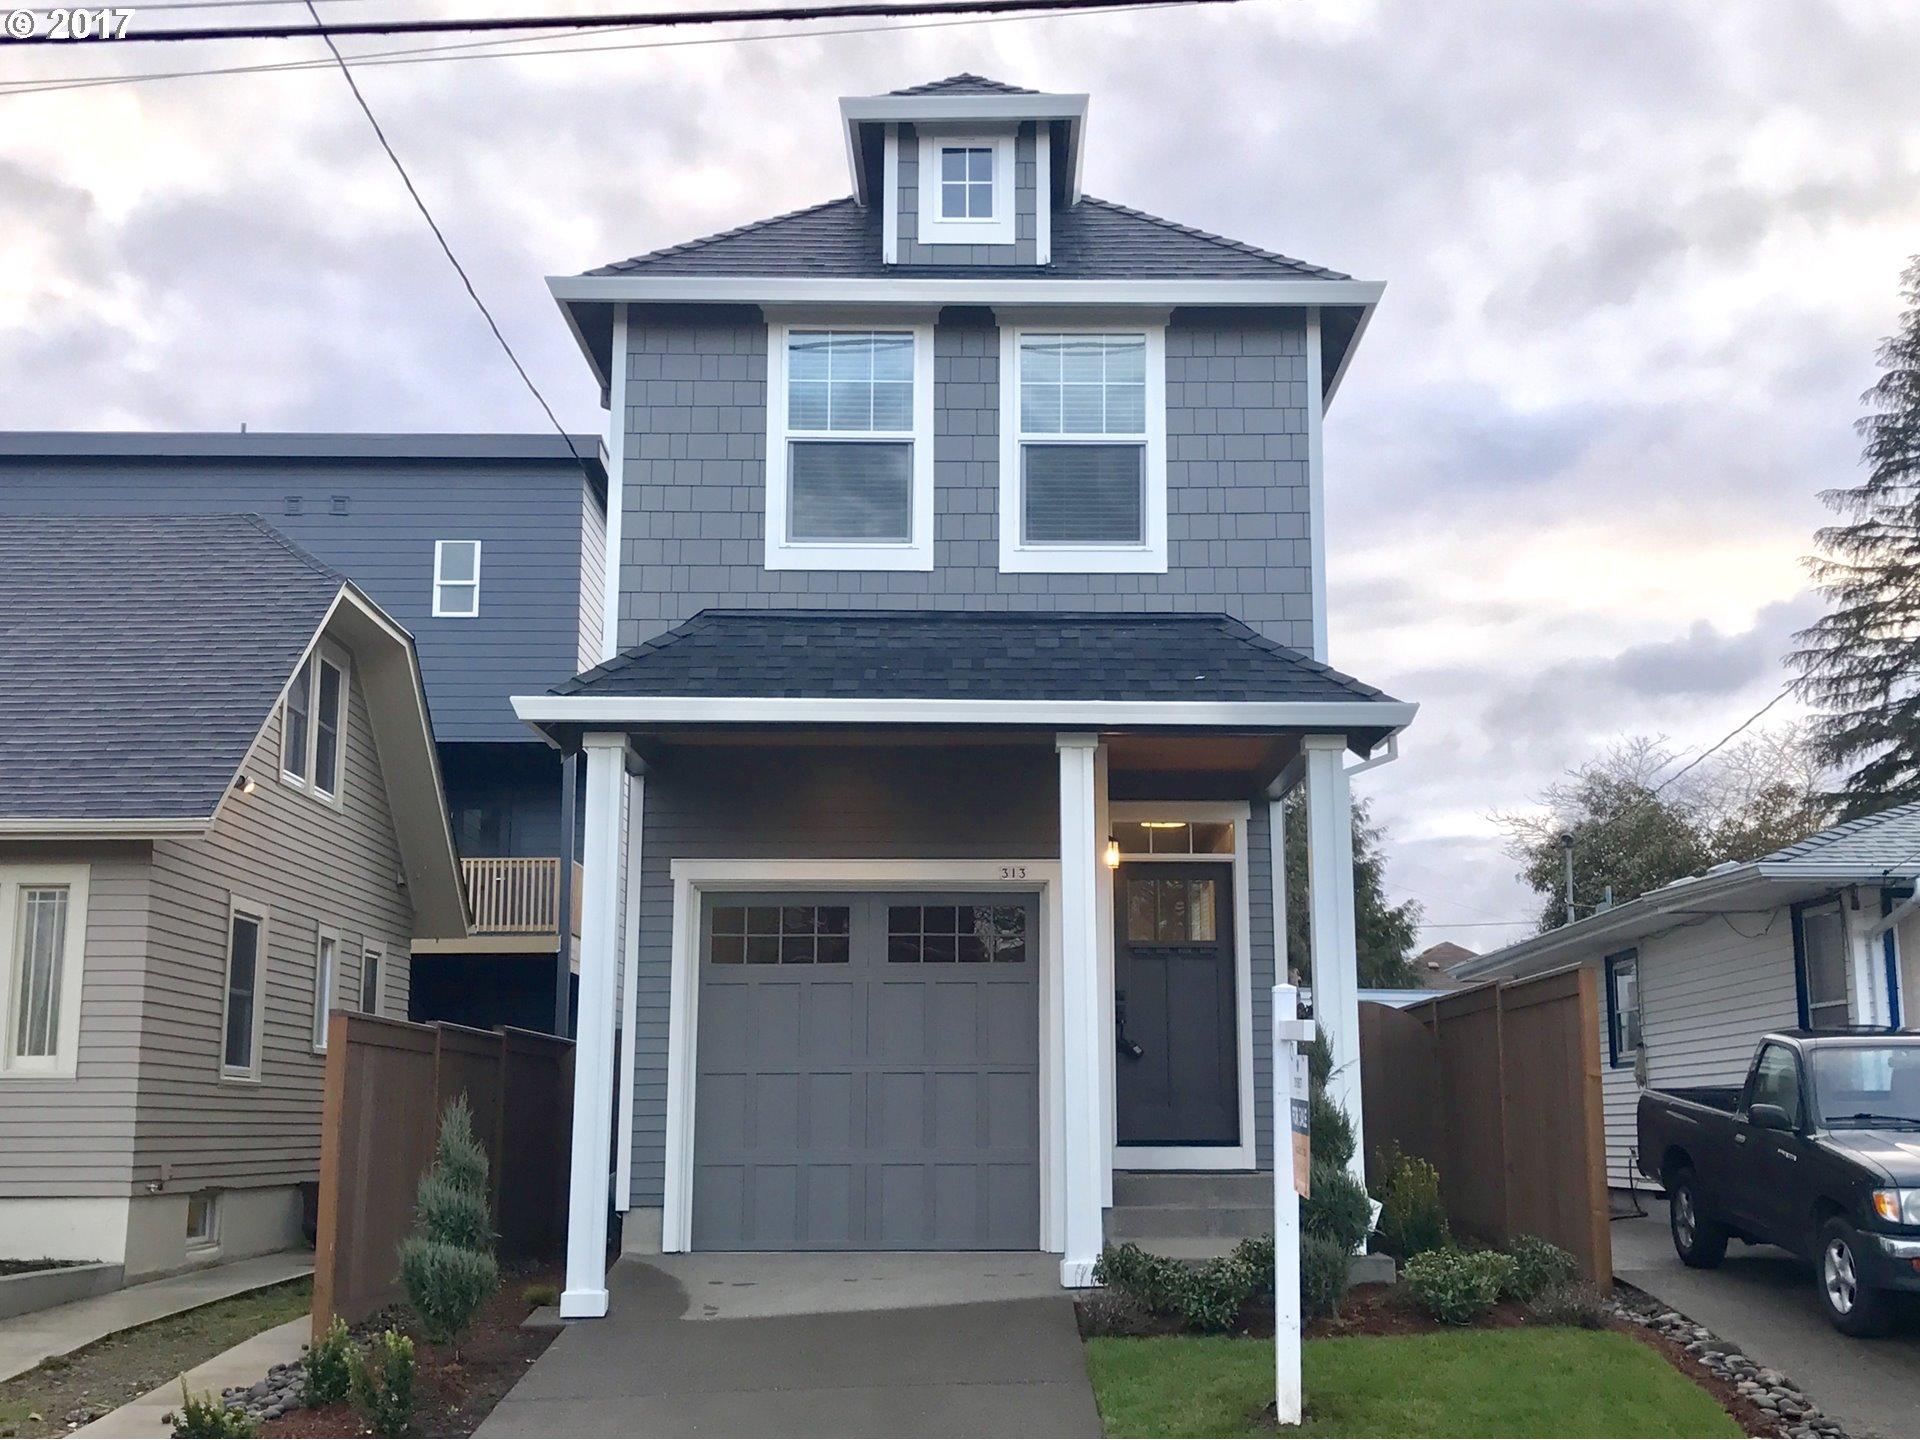 313 NE 74TH AVE, Portland OR 97213